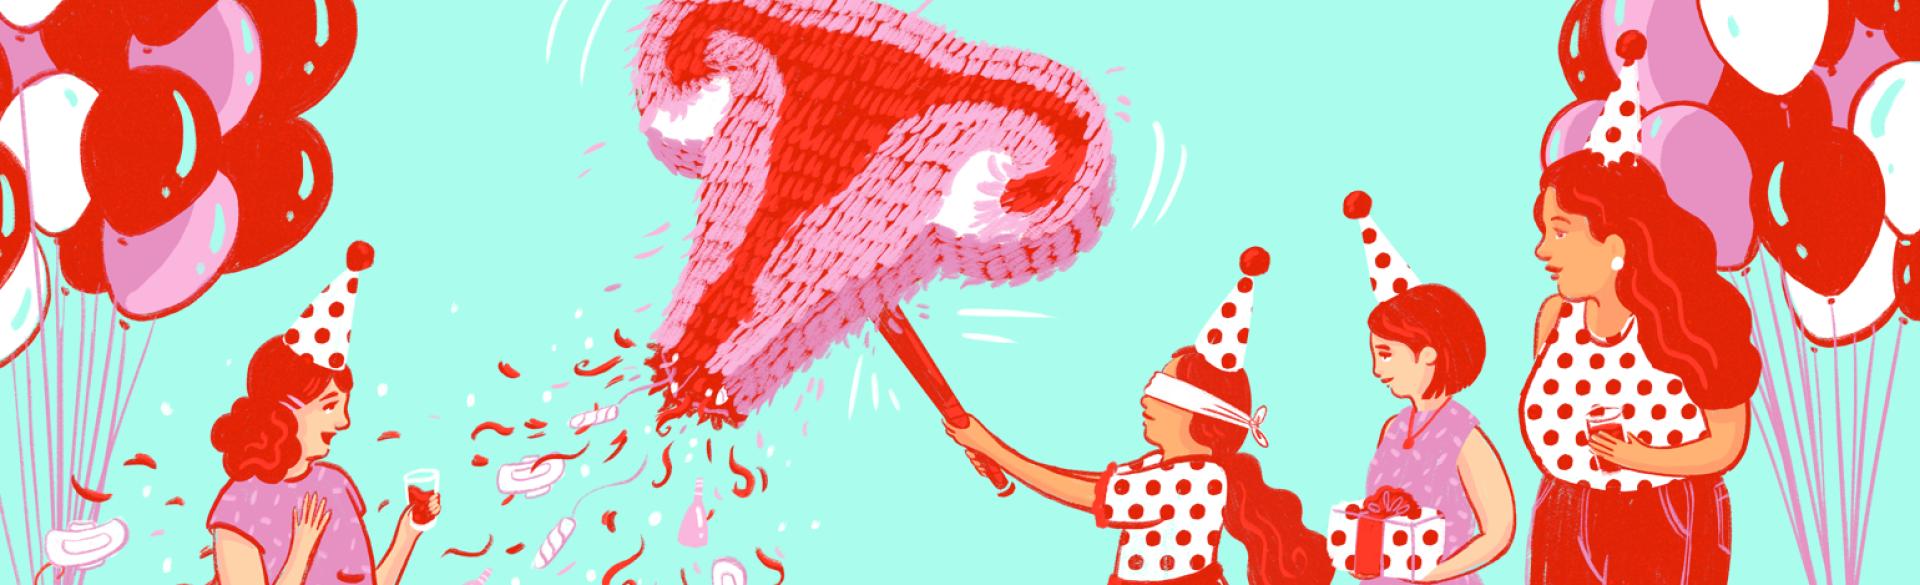 Period Party, womandhood, aarp, girlfriend, parenting